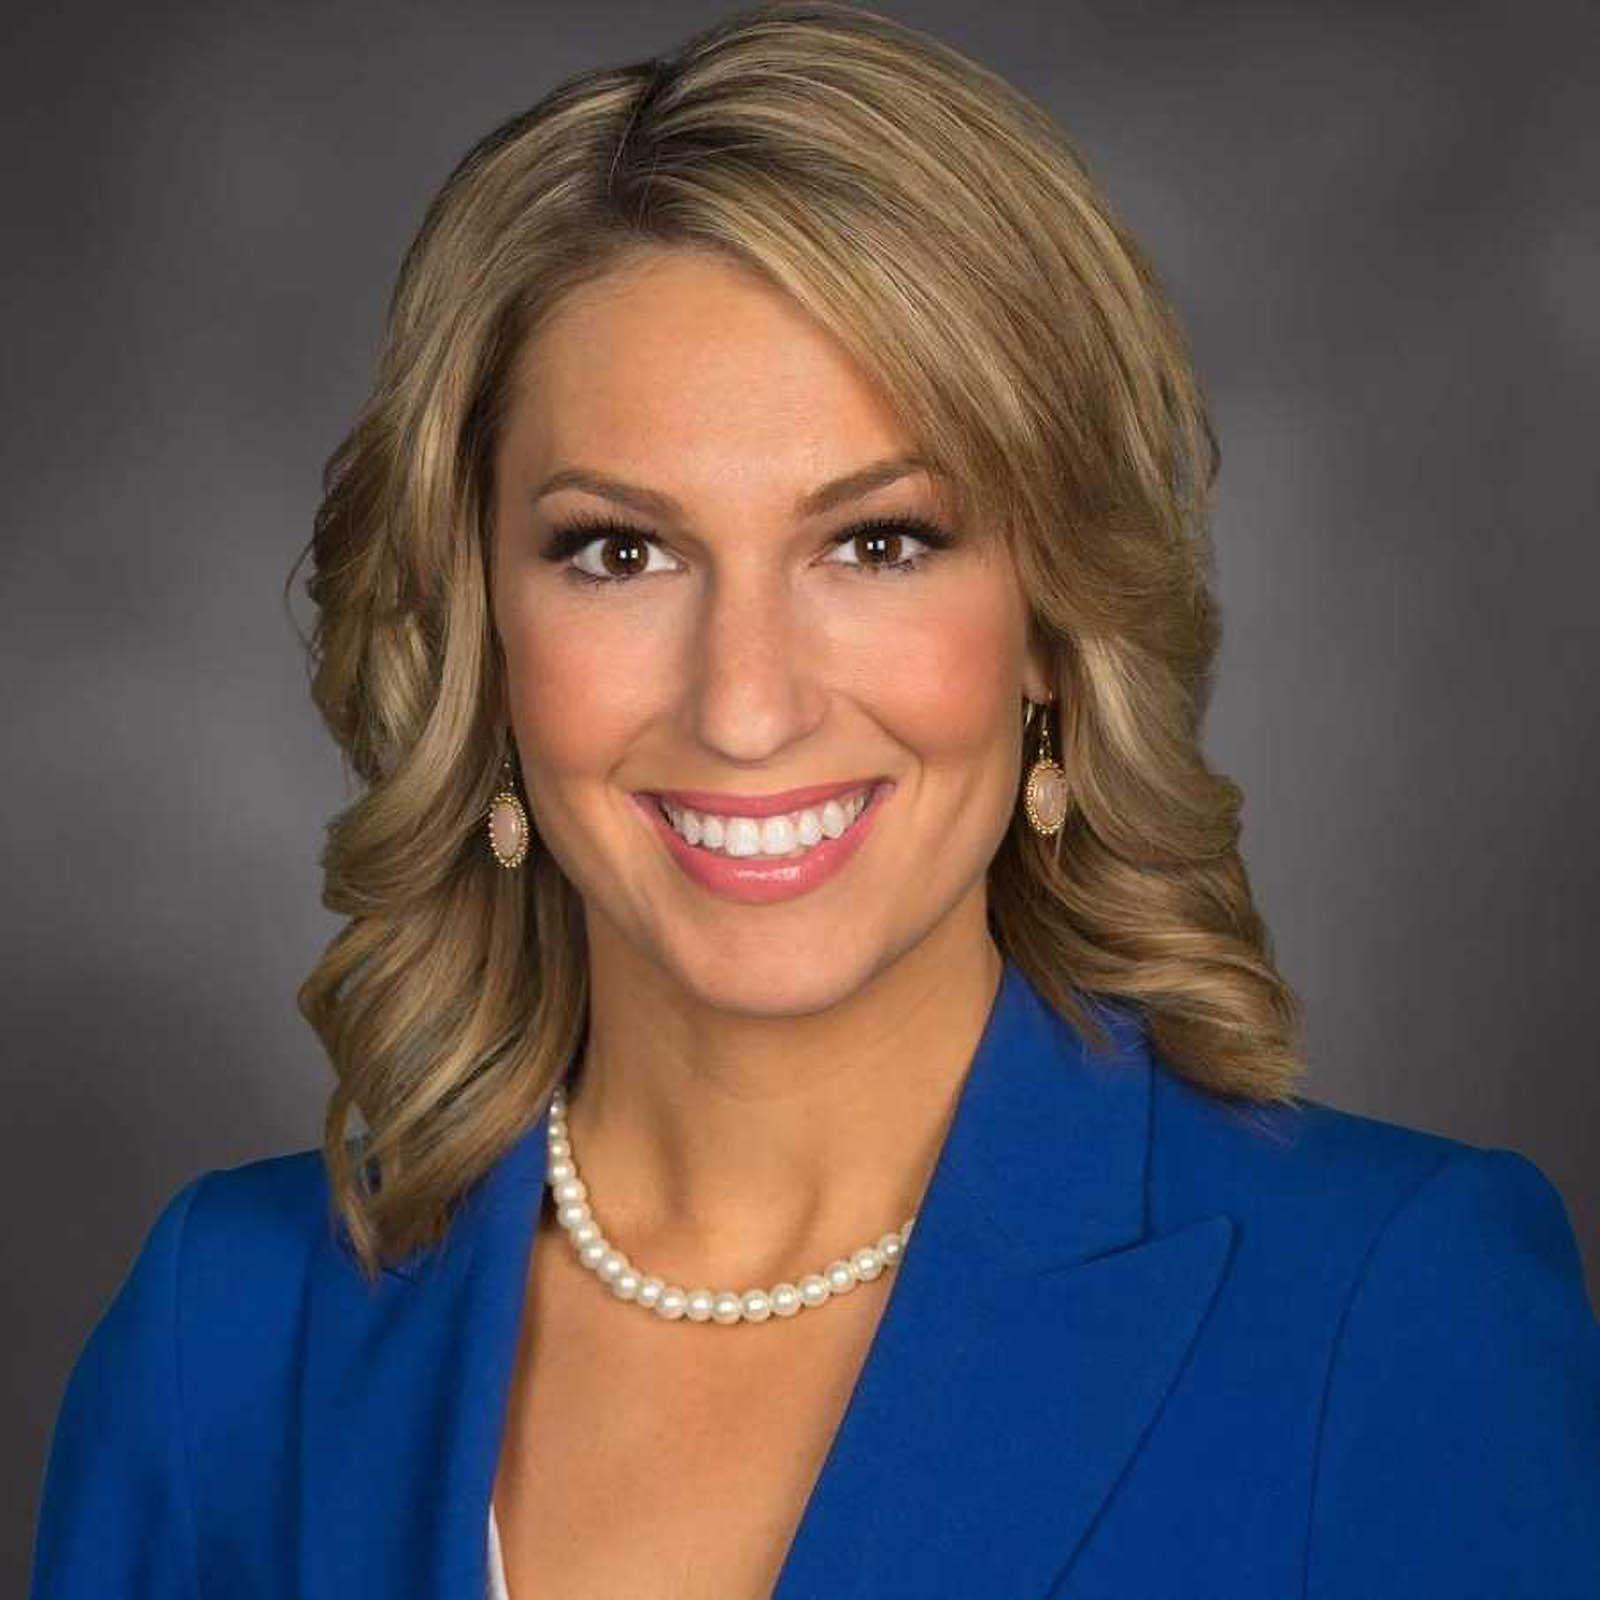 Emily Holwick famous anchor of KMBC 9 News